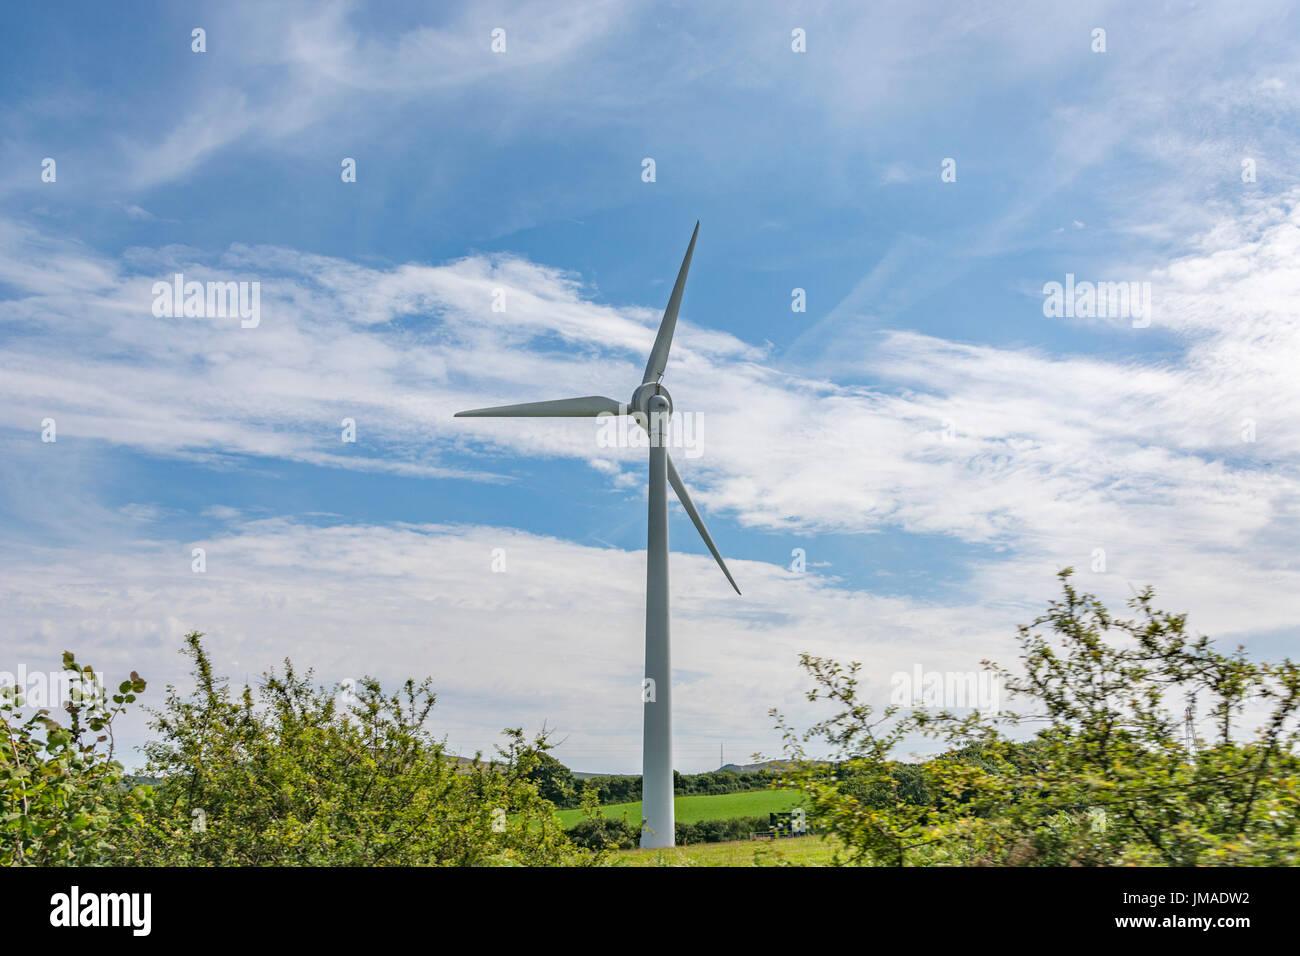 Giant wind turbine / wind generator in a field set against blue sky and sun. Metaphor clean energy, renewables, wind energy. - Stock Image